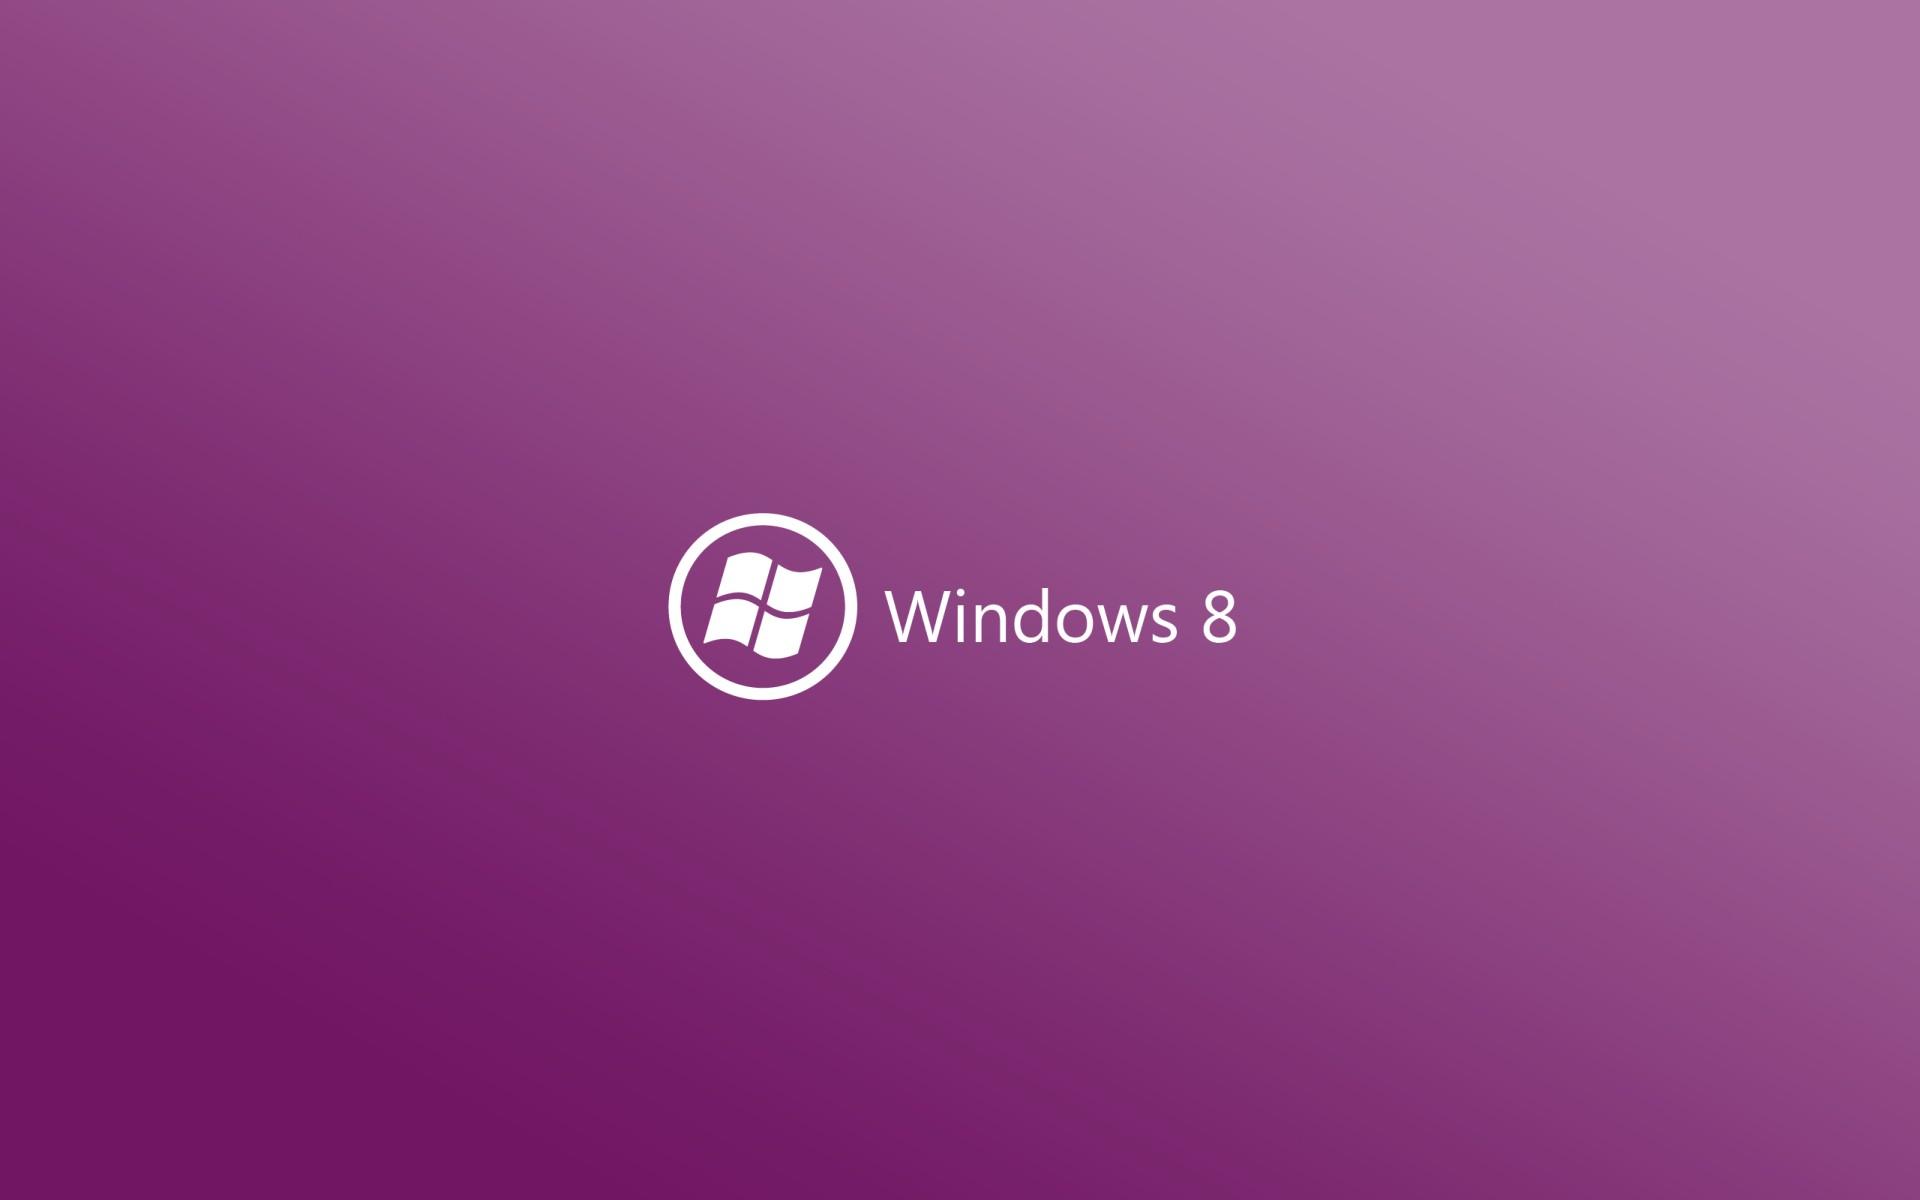 Windows 8 Wallpaper Logo on 10 Colors of Background Zon Saja 1920x1200